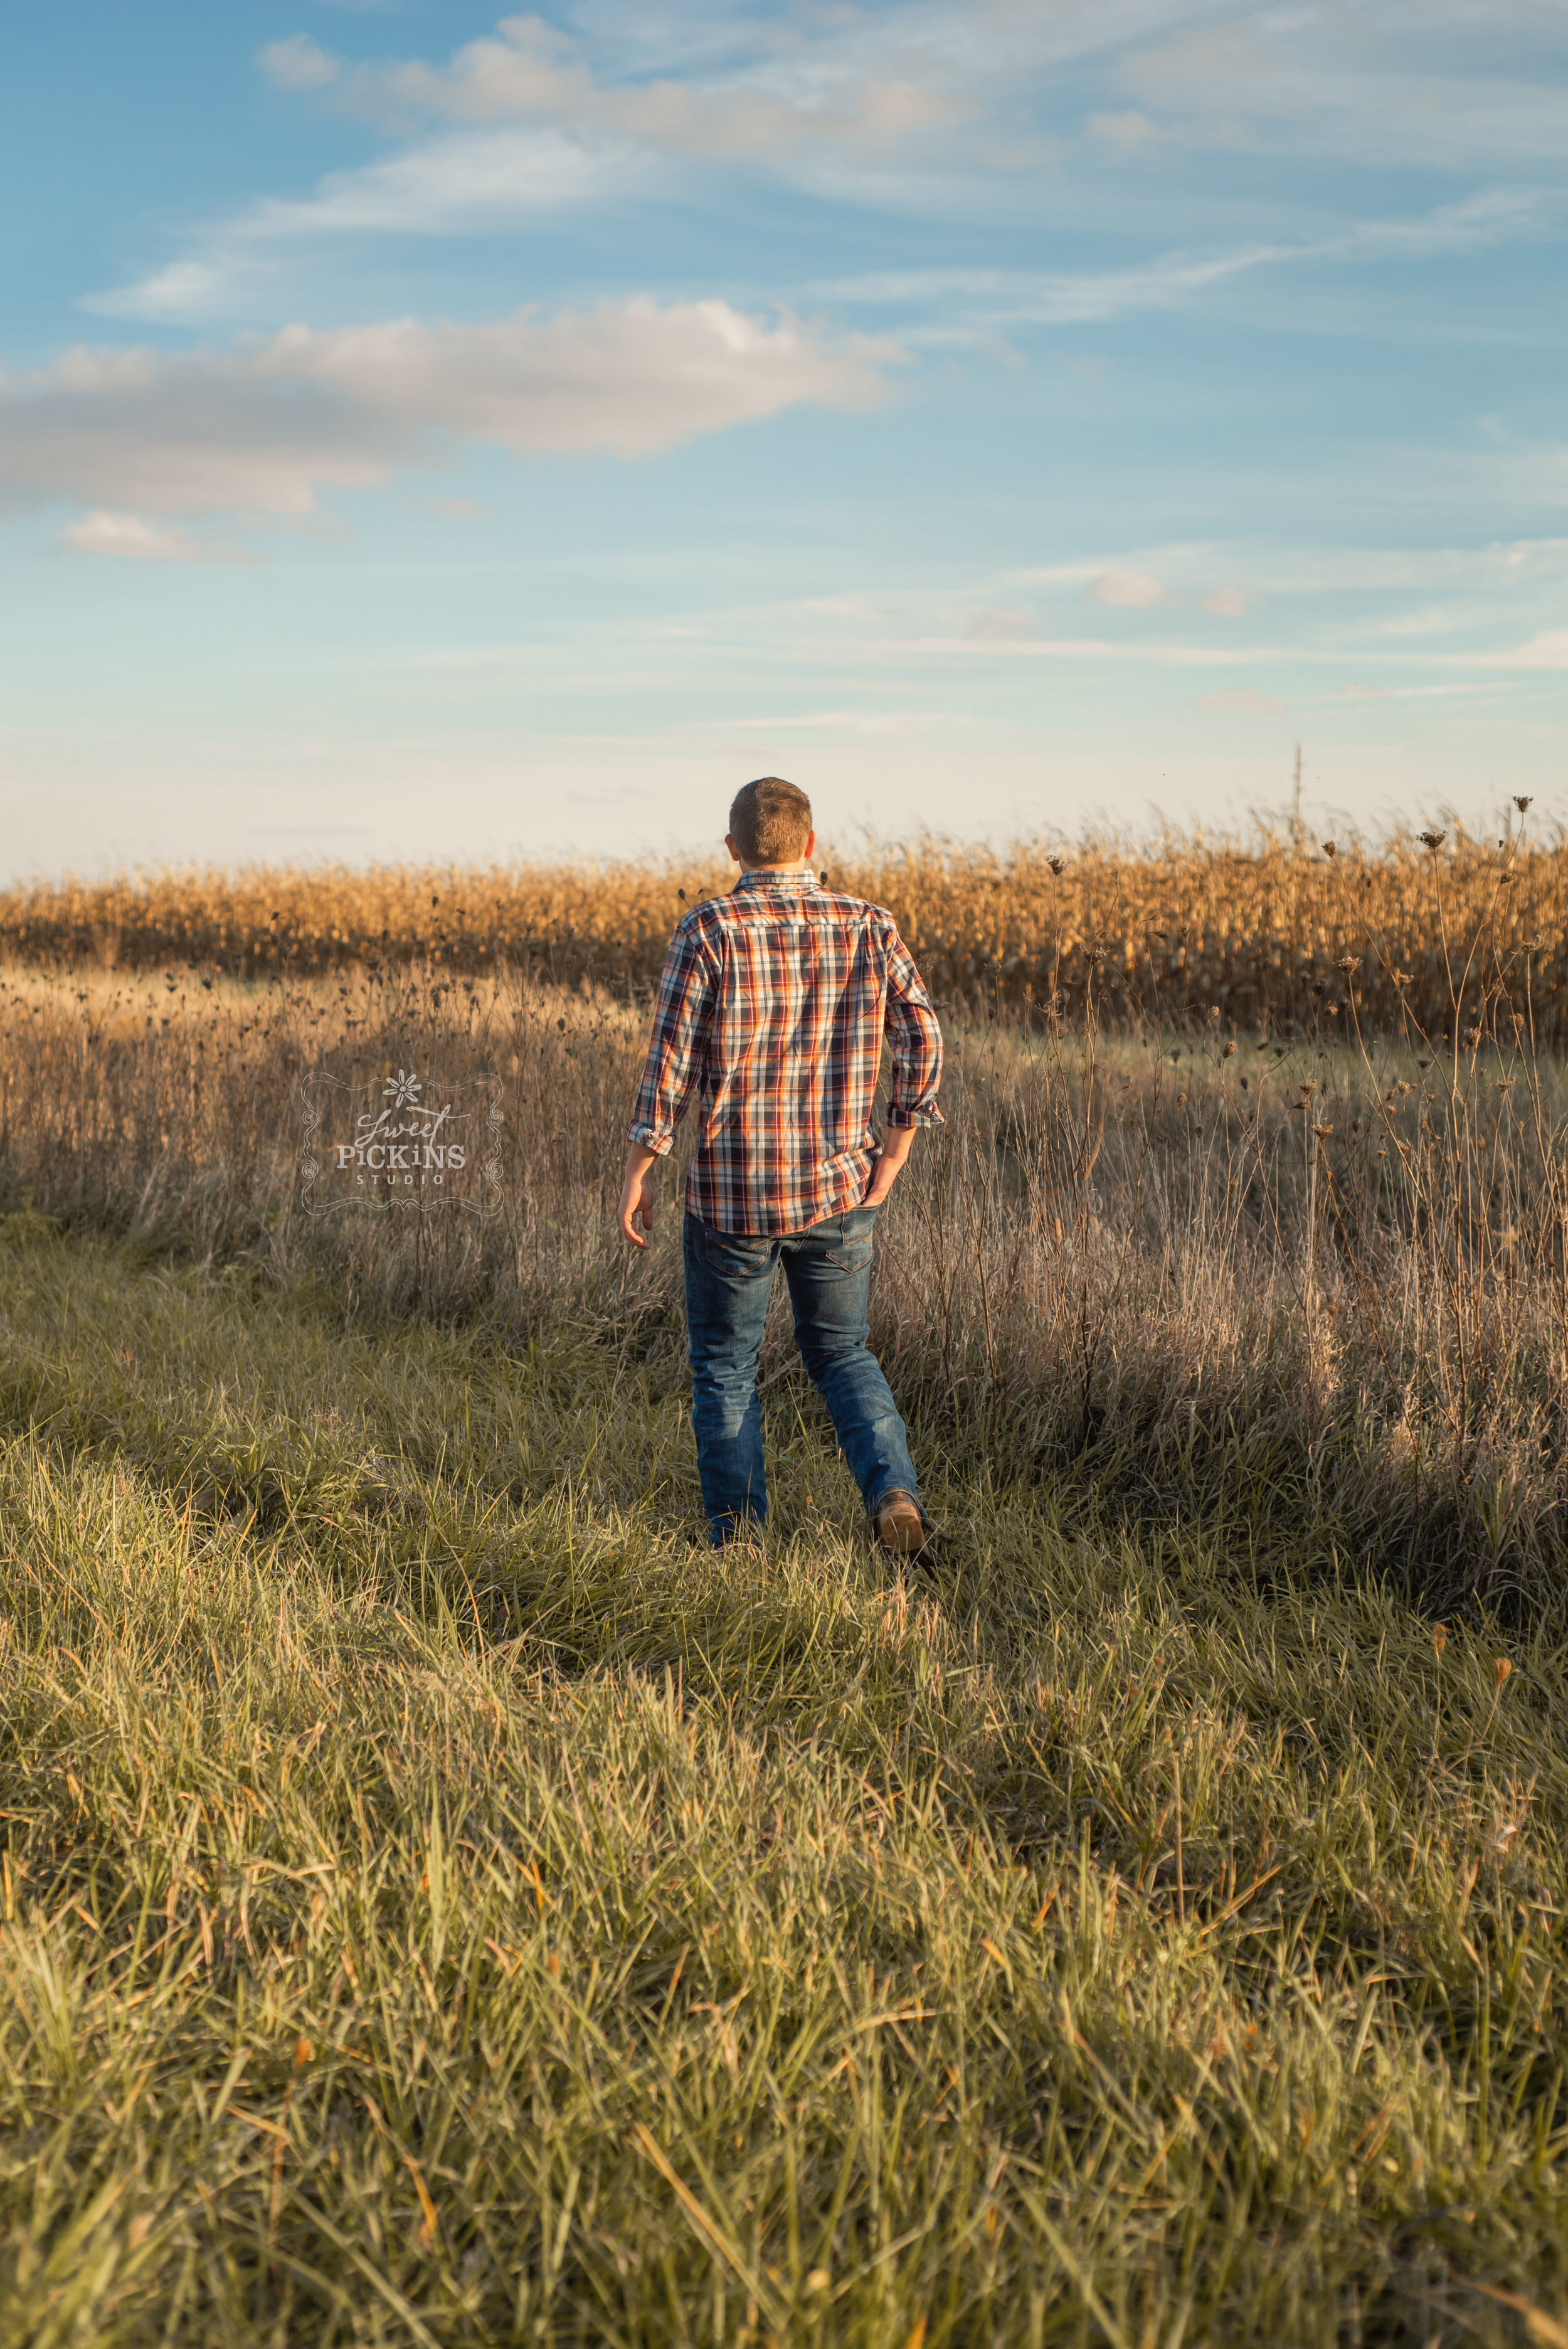 Peru, IN Senior Guy walking in farm field looking at autumn corn